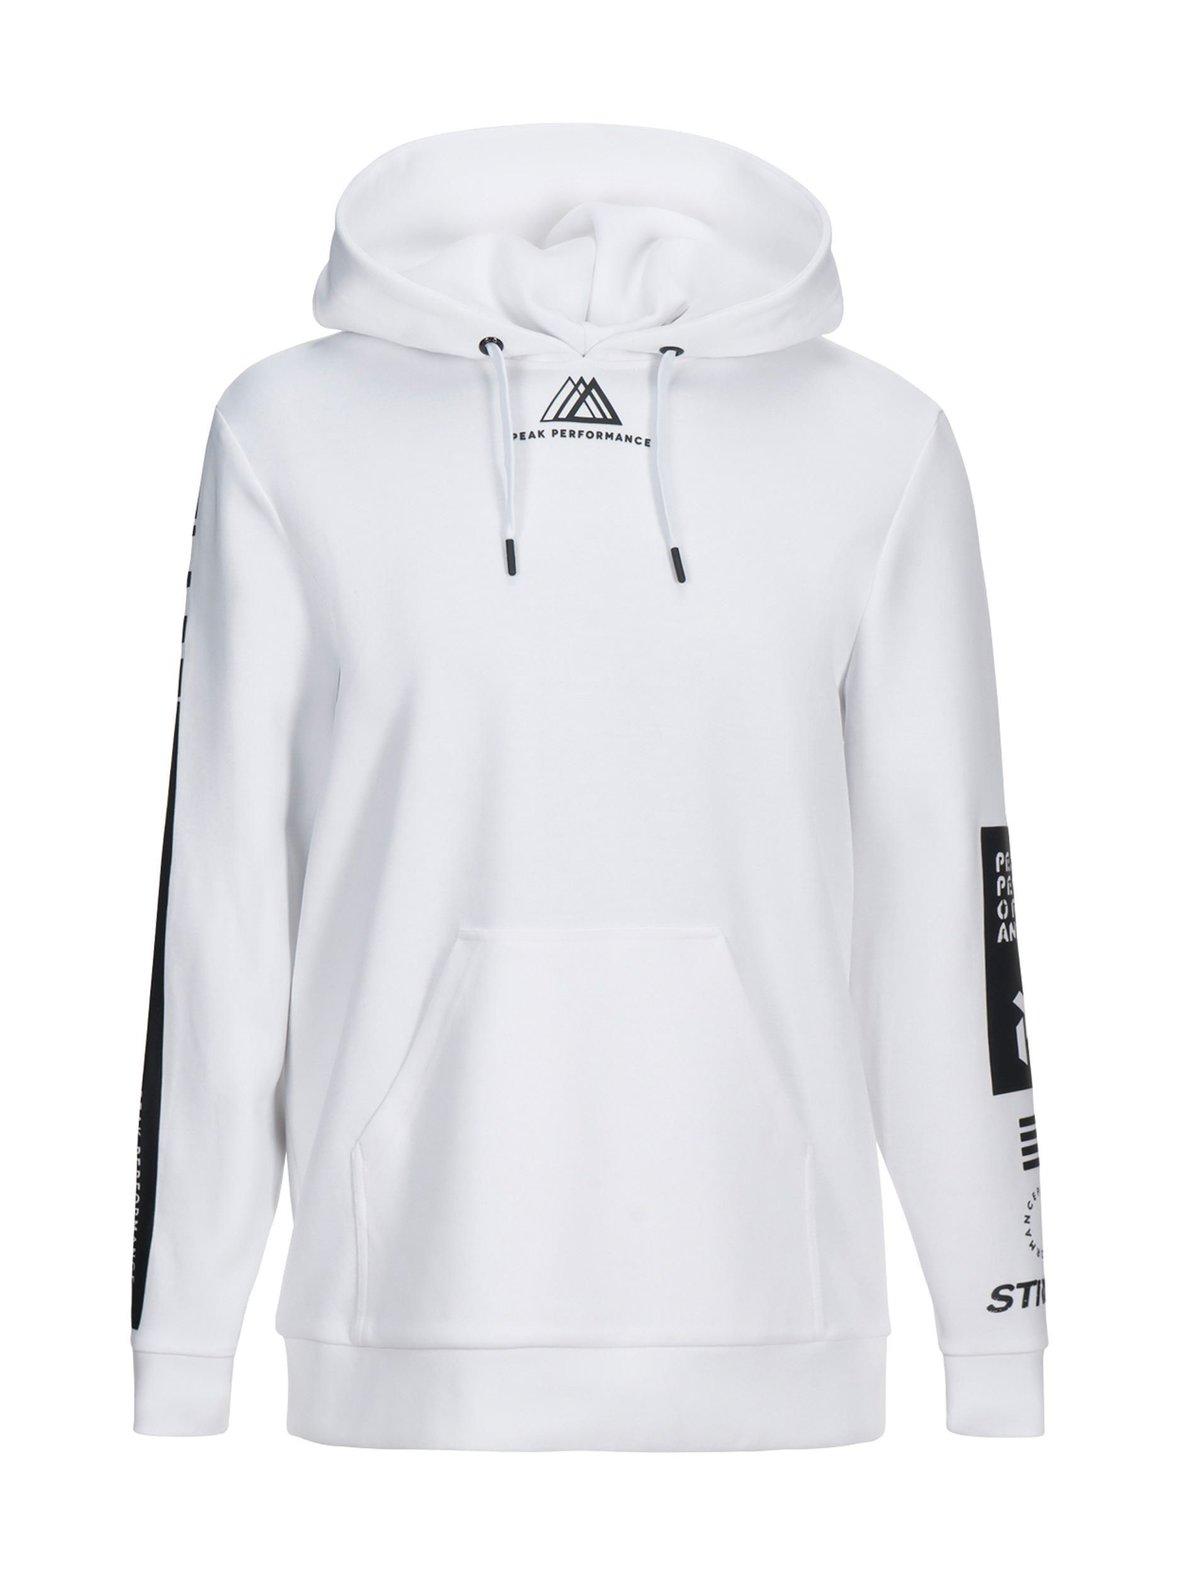 White (valkoinen) Peak Performance M Tech Cotton Blend Zip-Up Hoodie ... 03f6fb089c